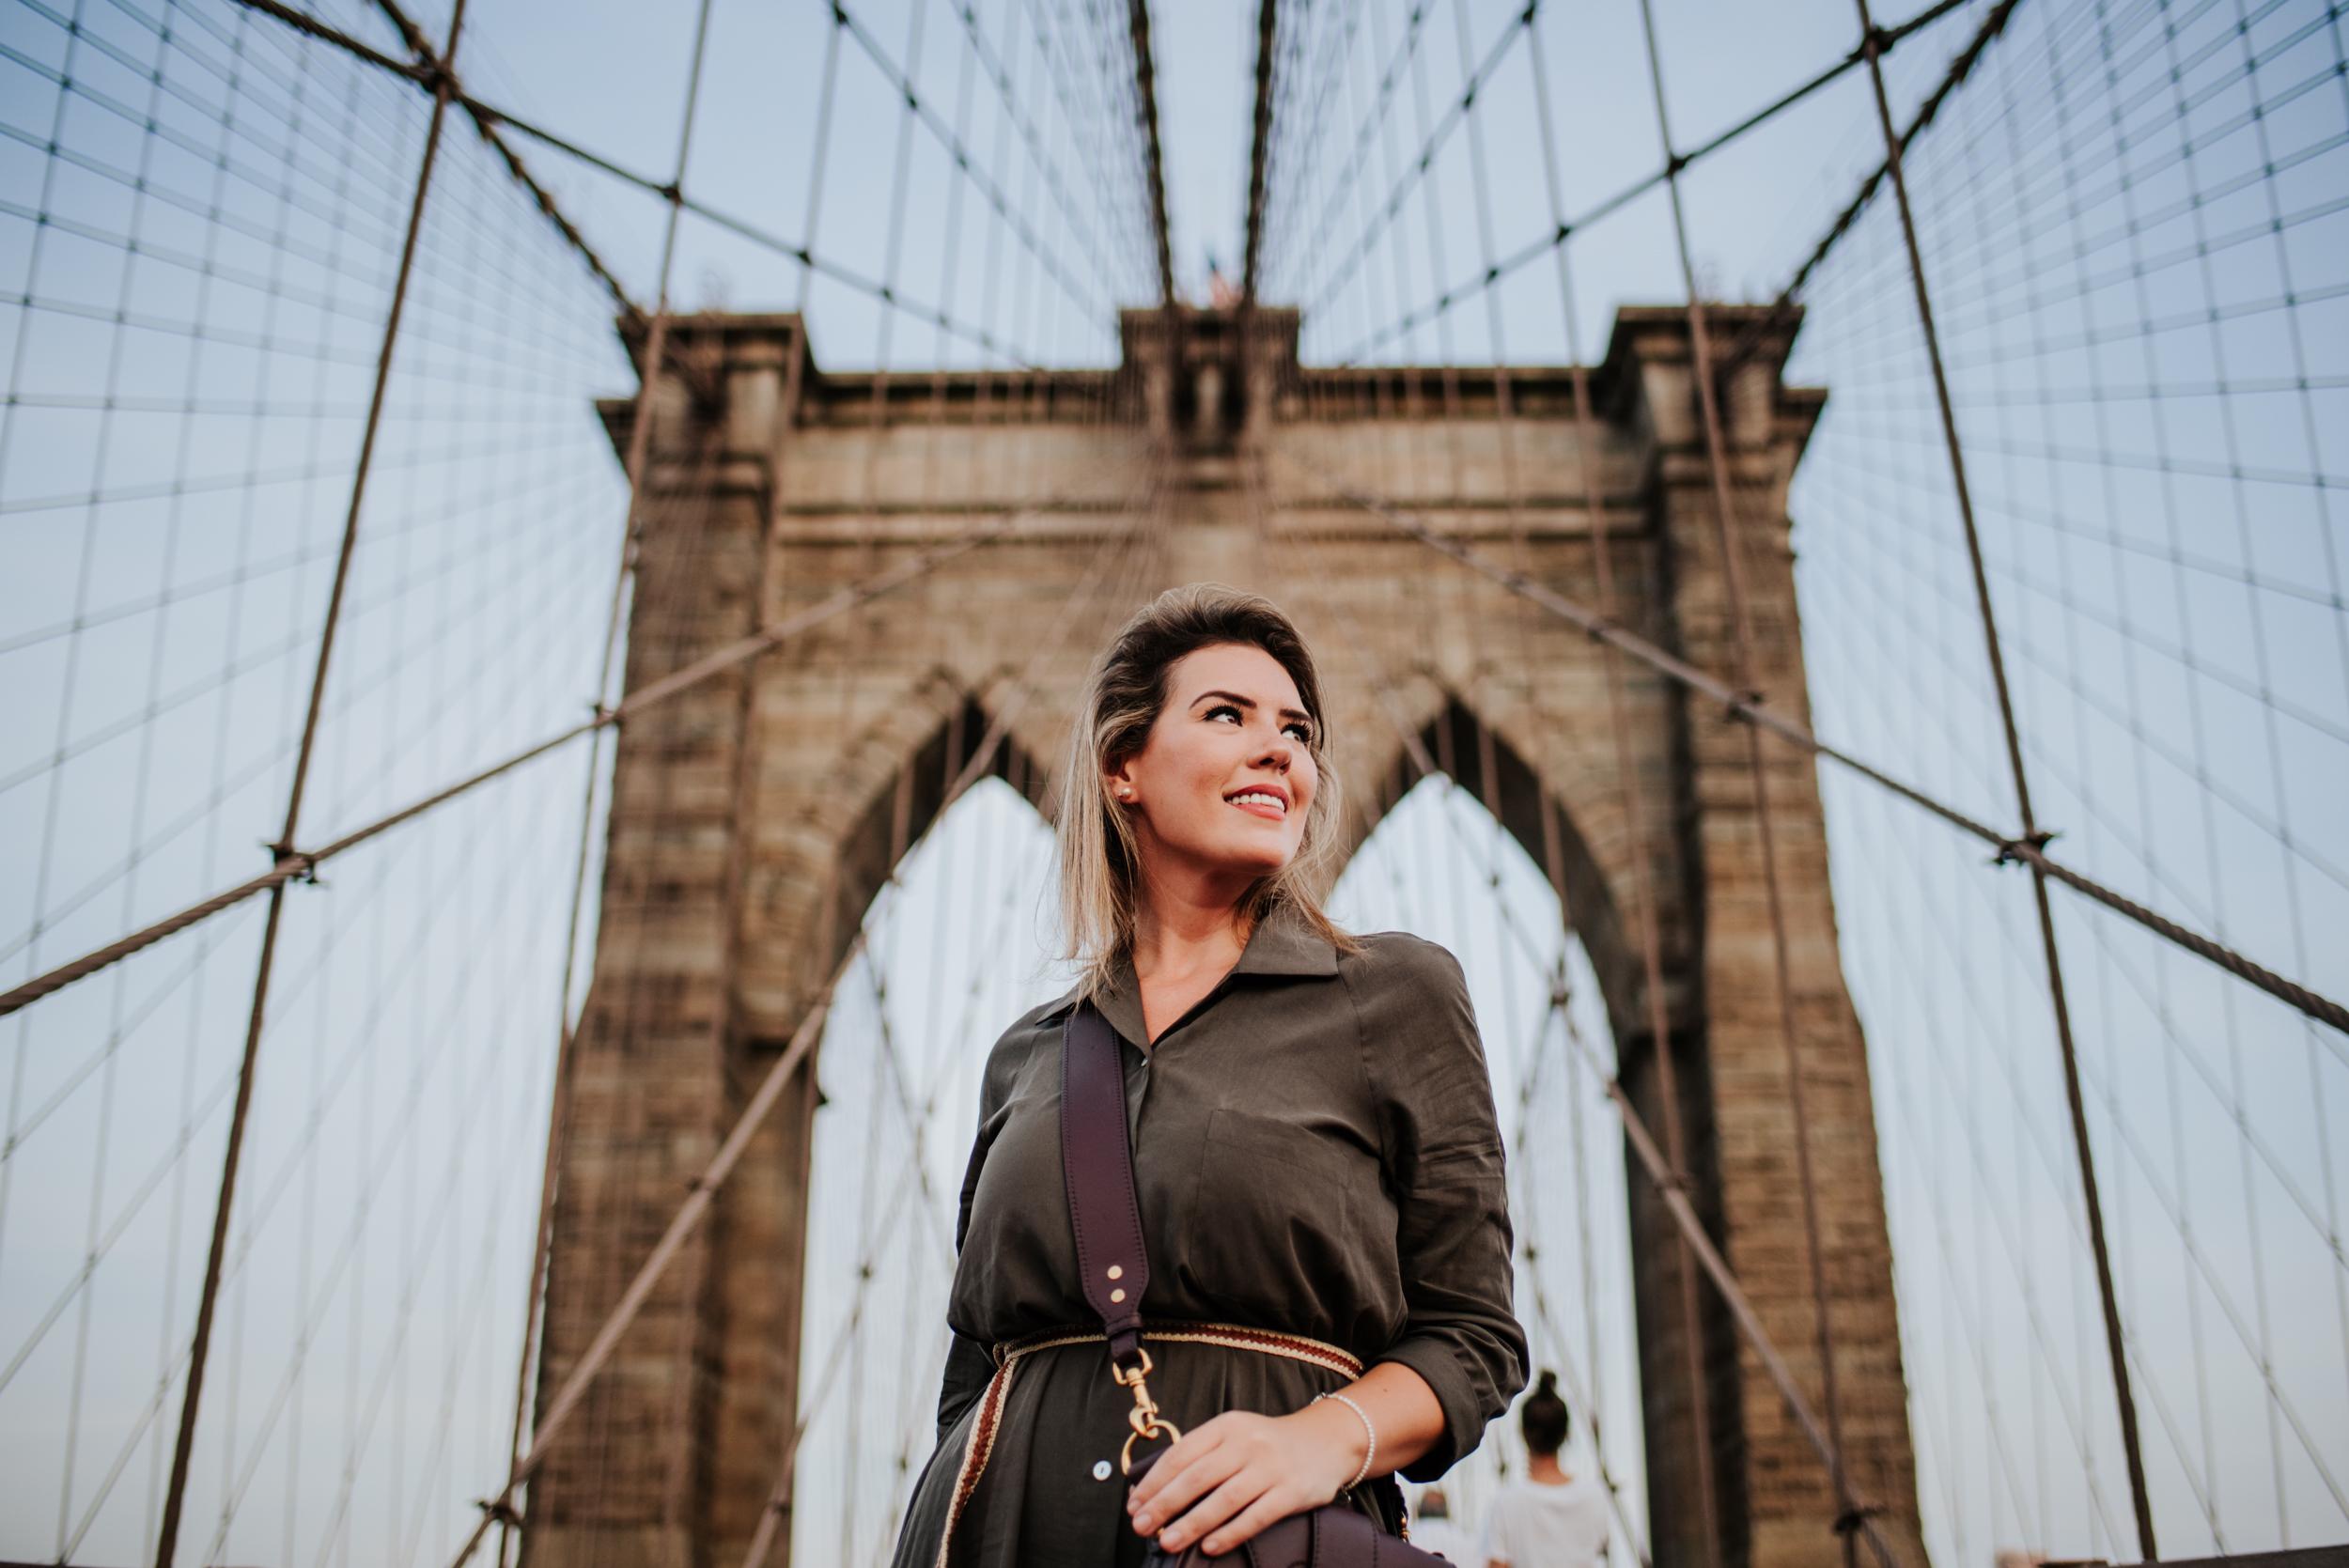 Sesion en new york por Malvina Battiston - Sol Bria 2019 - New York 081.JPG